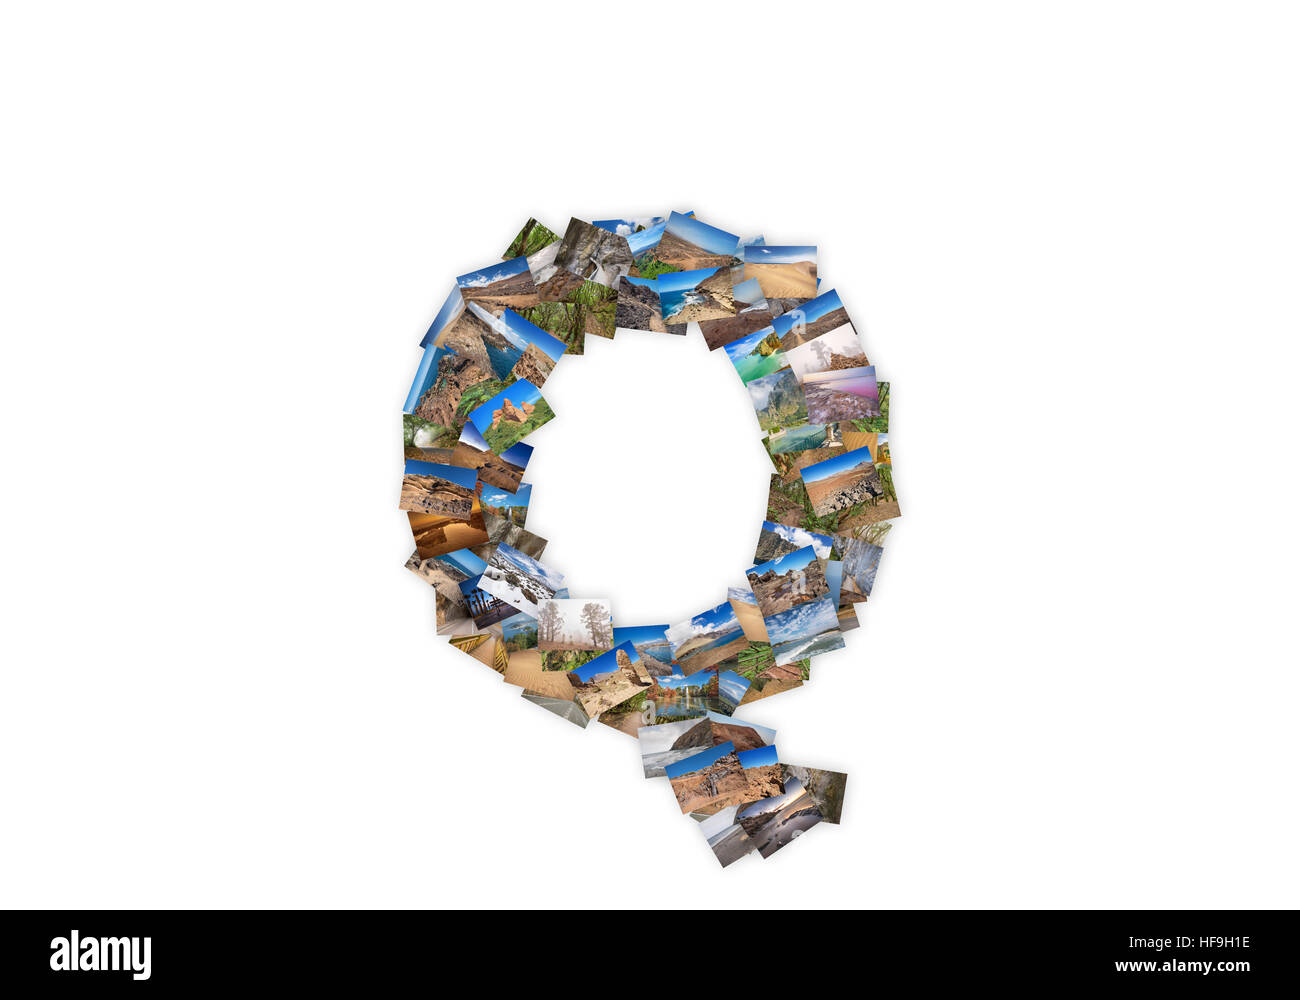 Letter Q uppercase font shape alphabet collage made of my best landscape photographs. Version 3. - Stock Image